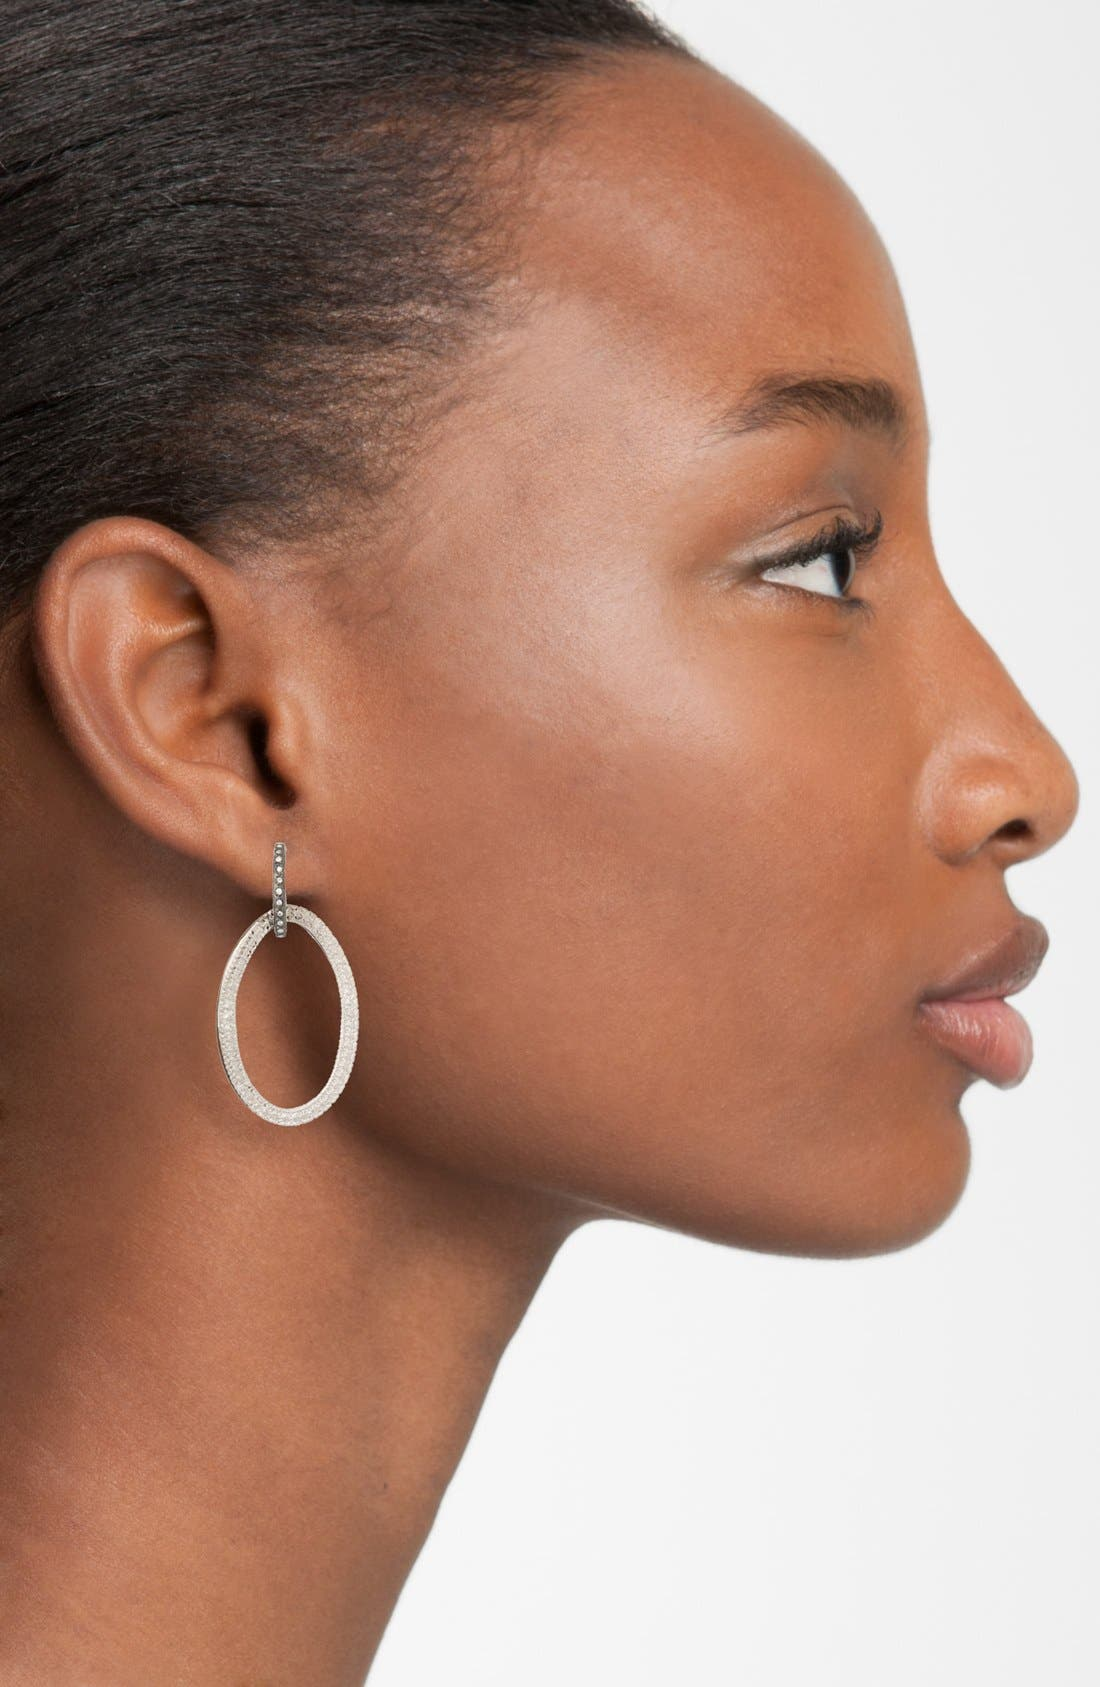 Old World Midnight Frontal Hoop Diamond Earrings,                             Alternate thumbnail 2, color,                             Silver